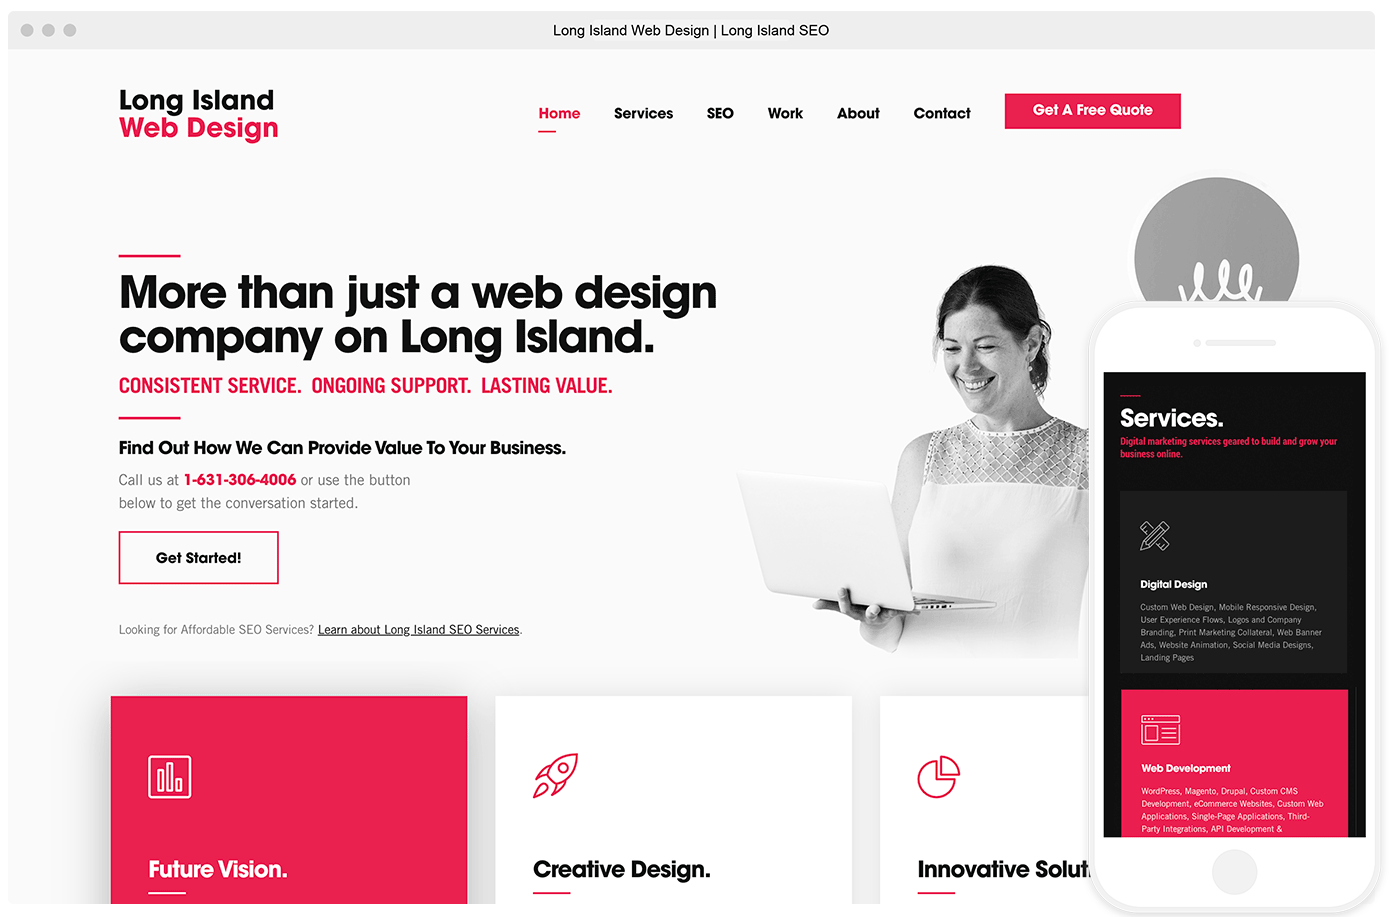 website of long island web design